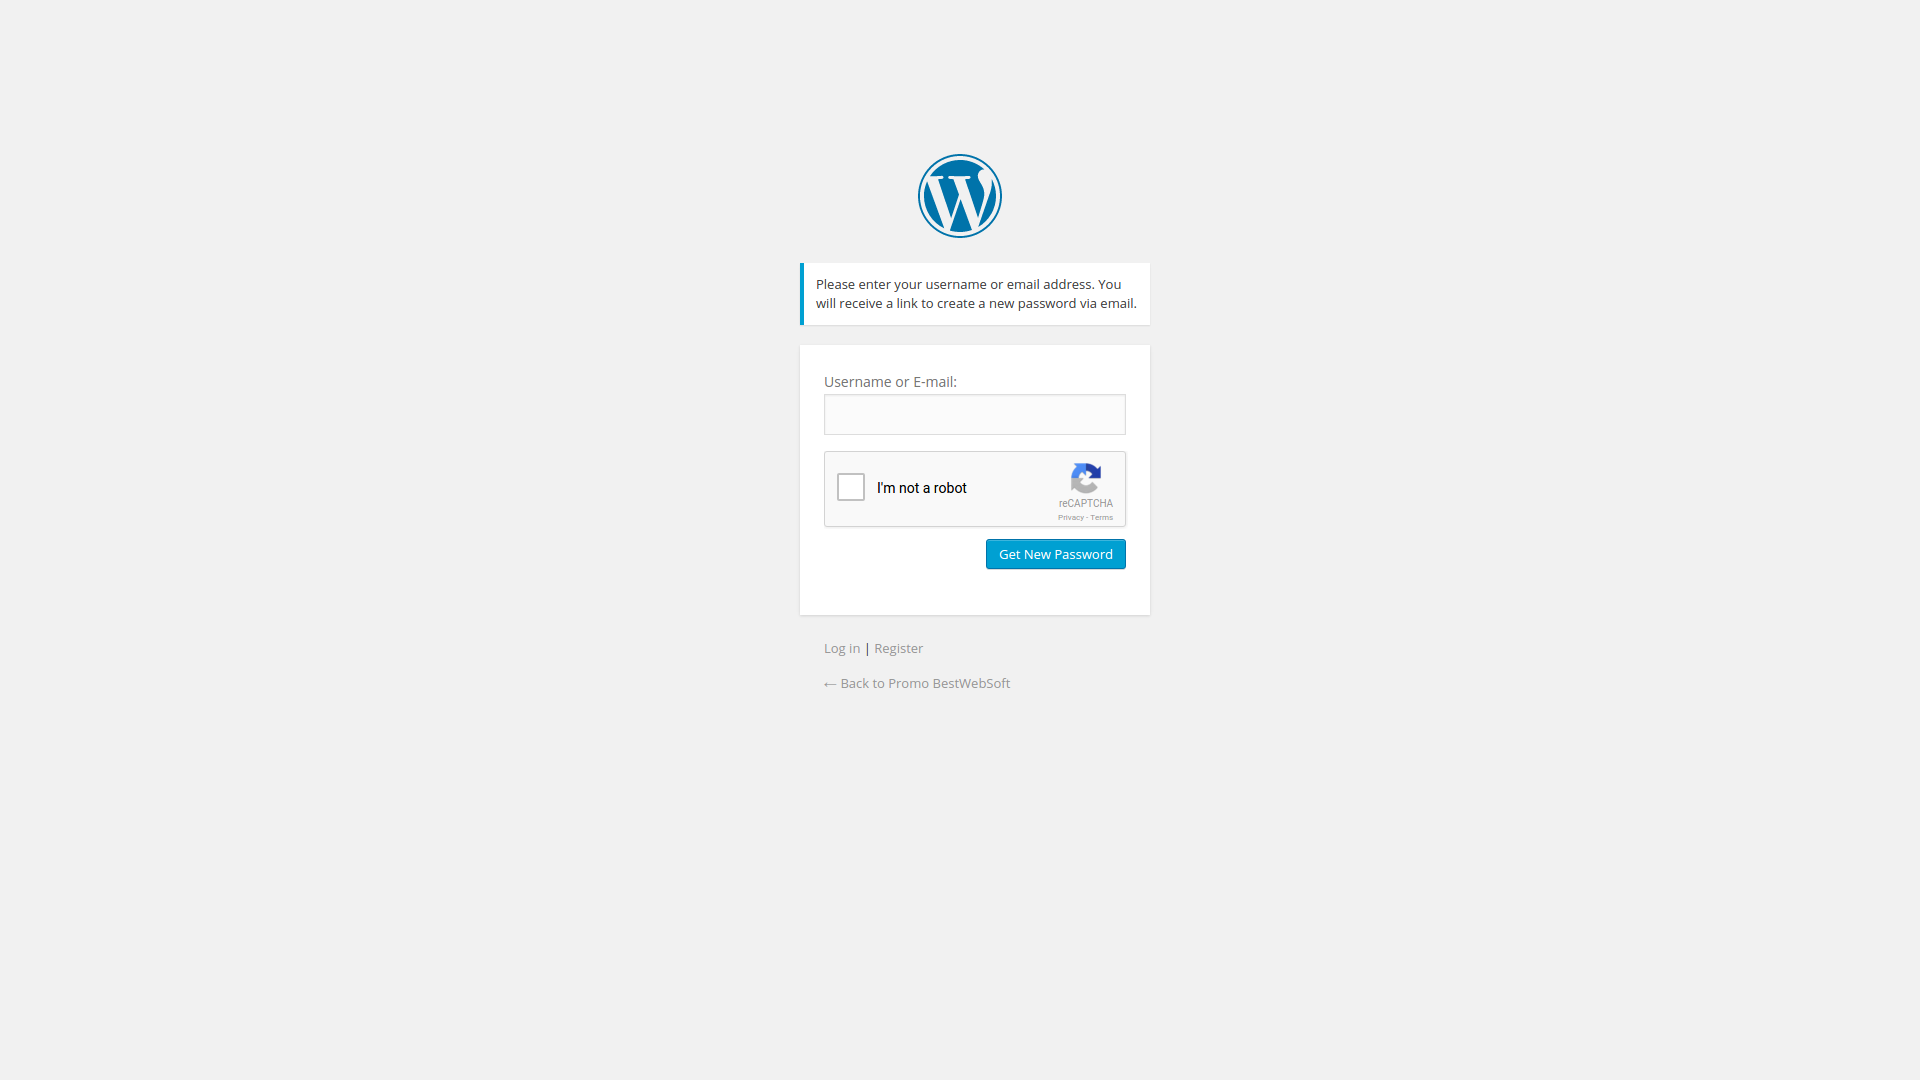 Lost password form with reCaptcha.